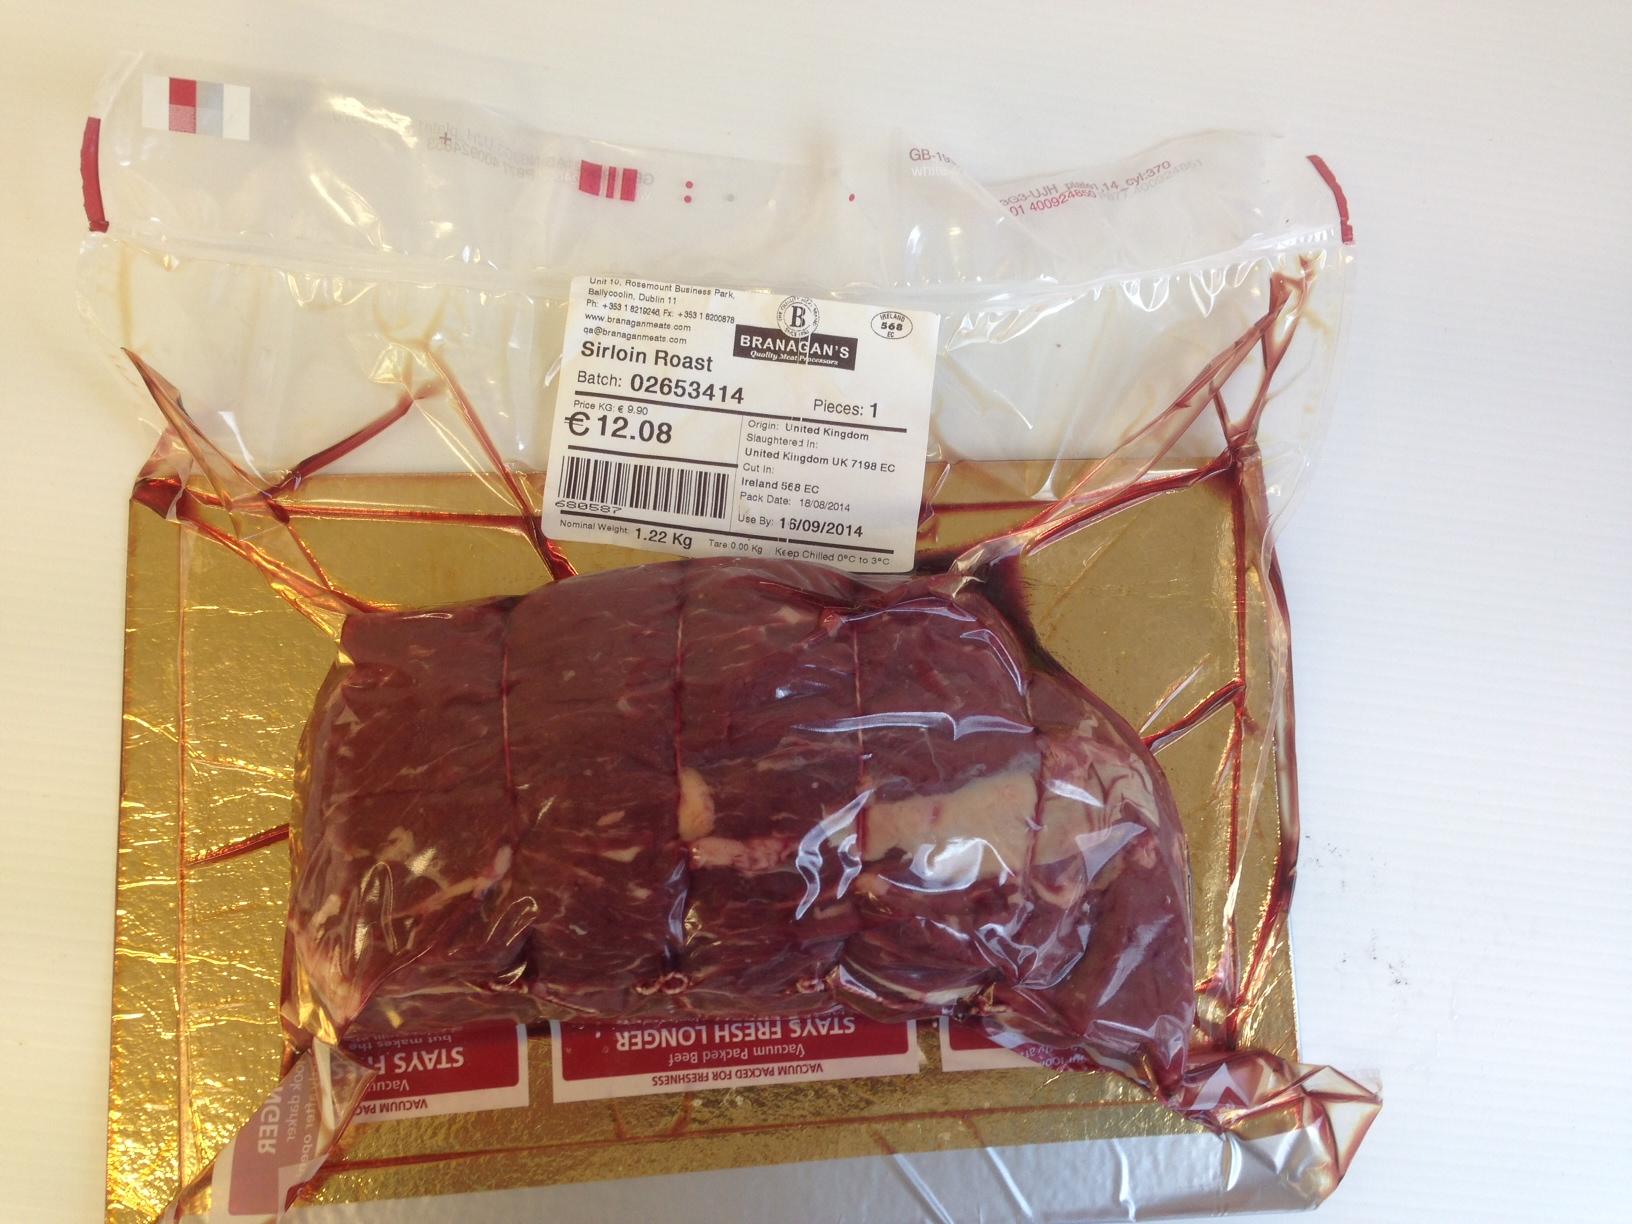 Sirloin_roast_1.22kg_EURO_12.08.JPG